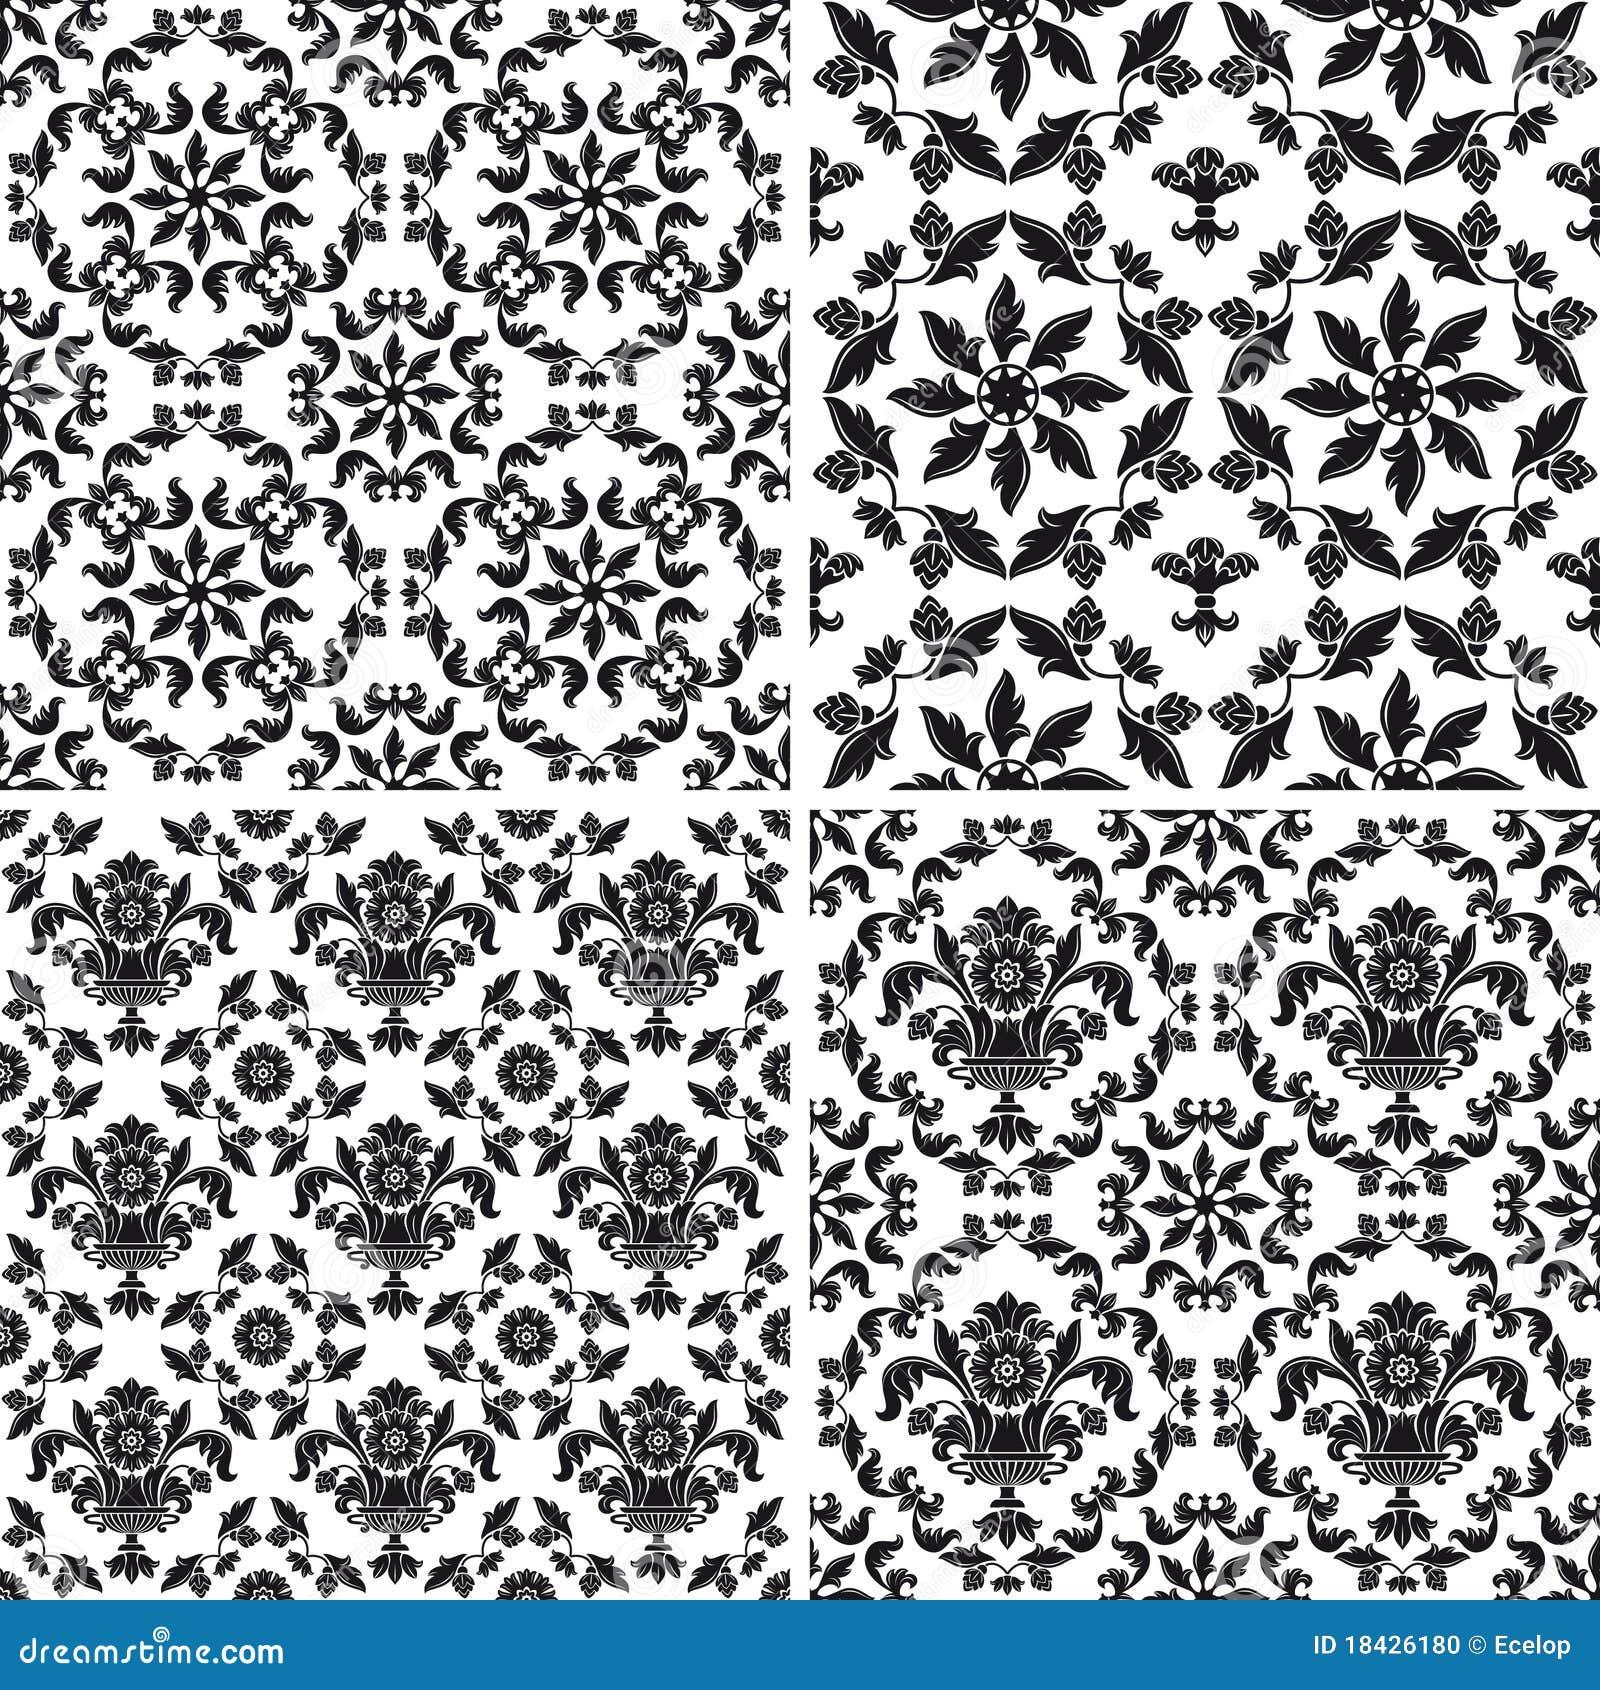 Carta Da Parati Floreale Bianco E Nero.Reticolo Senza Giunte Della Carta Da Parati Floreale In Bianco E